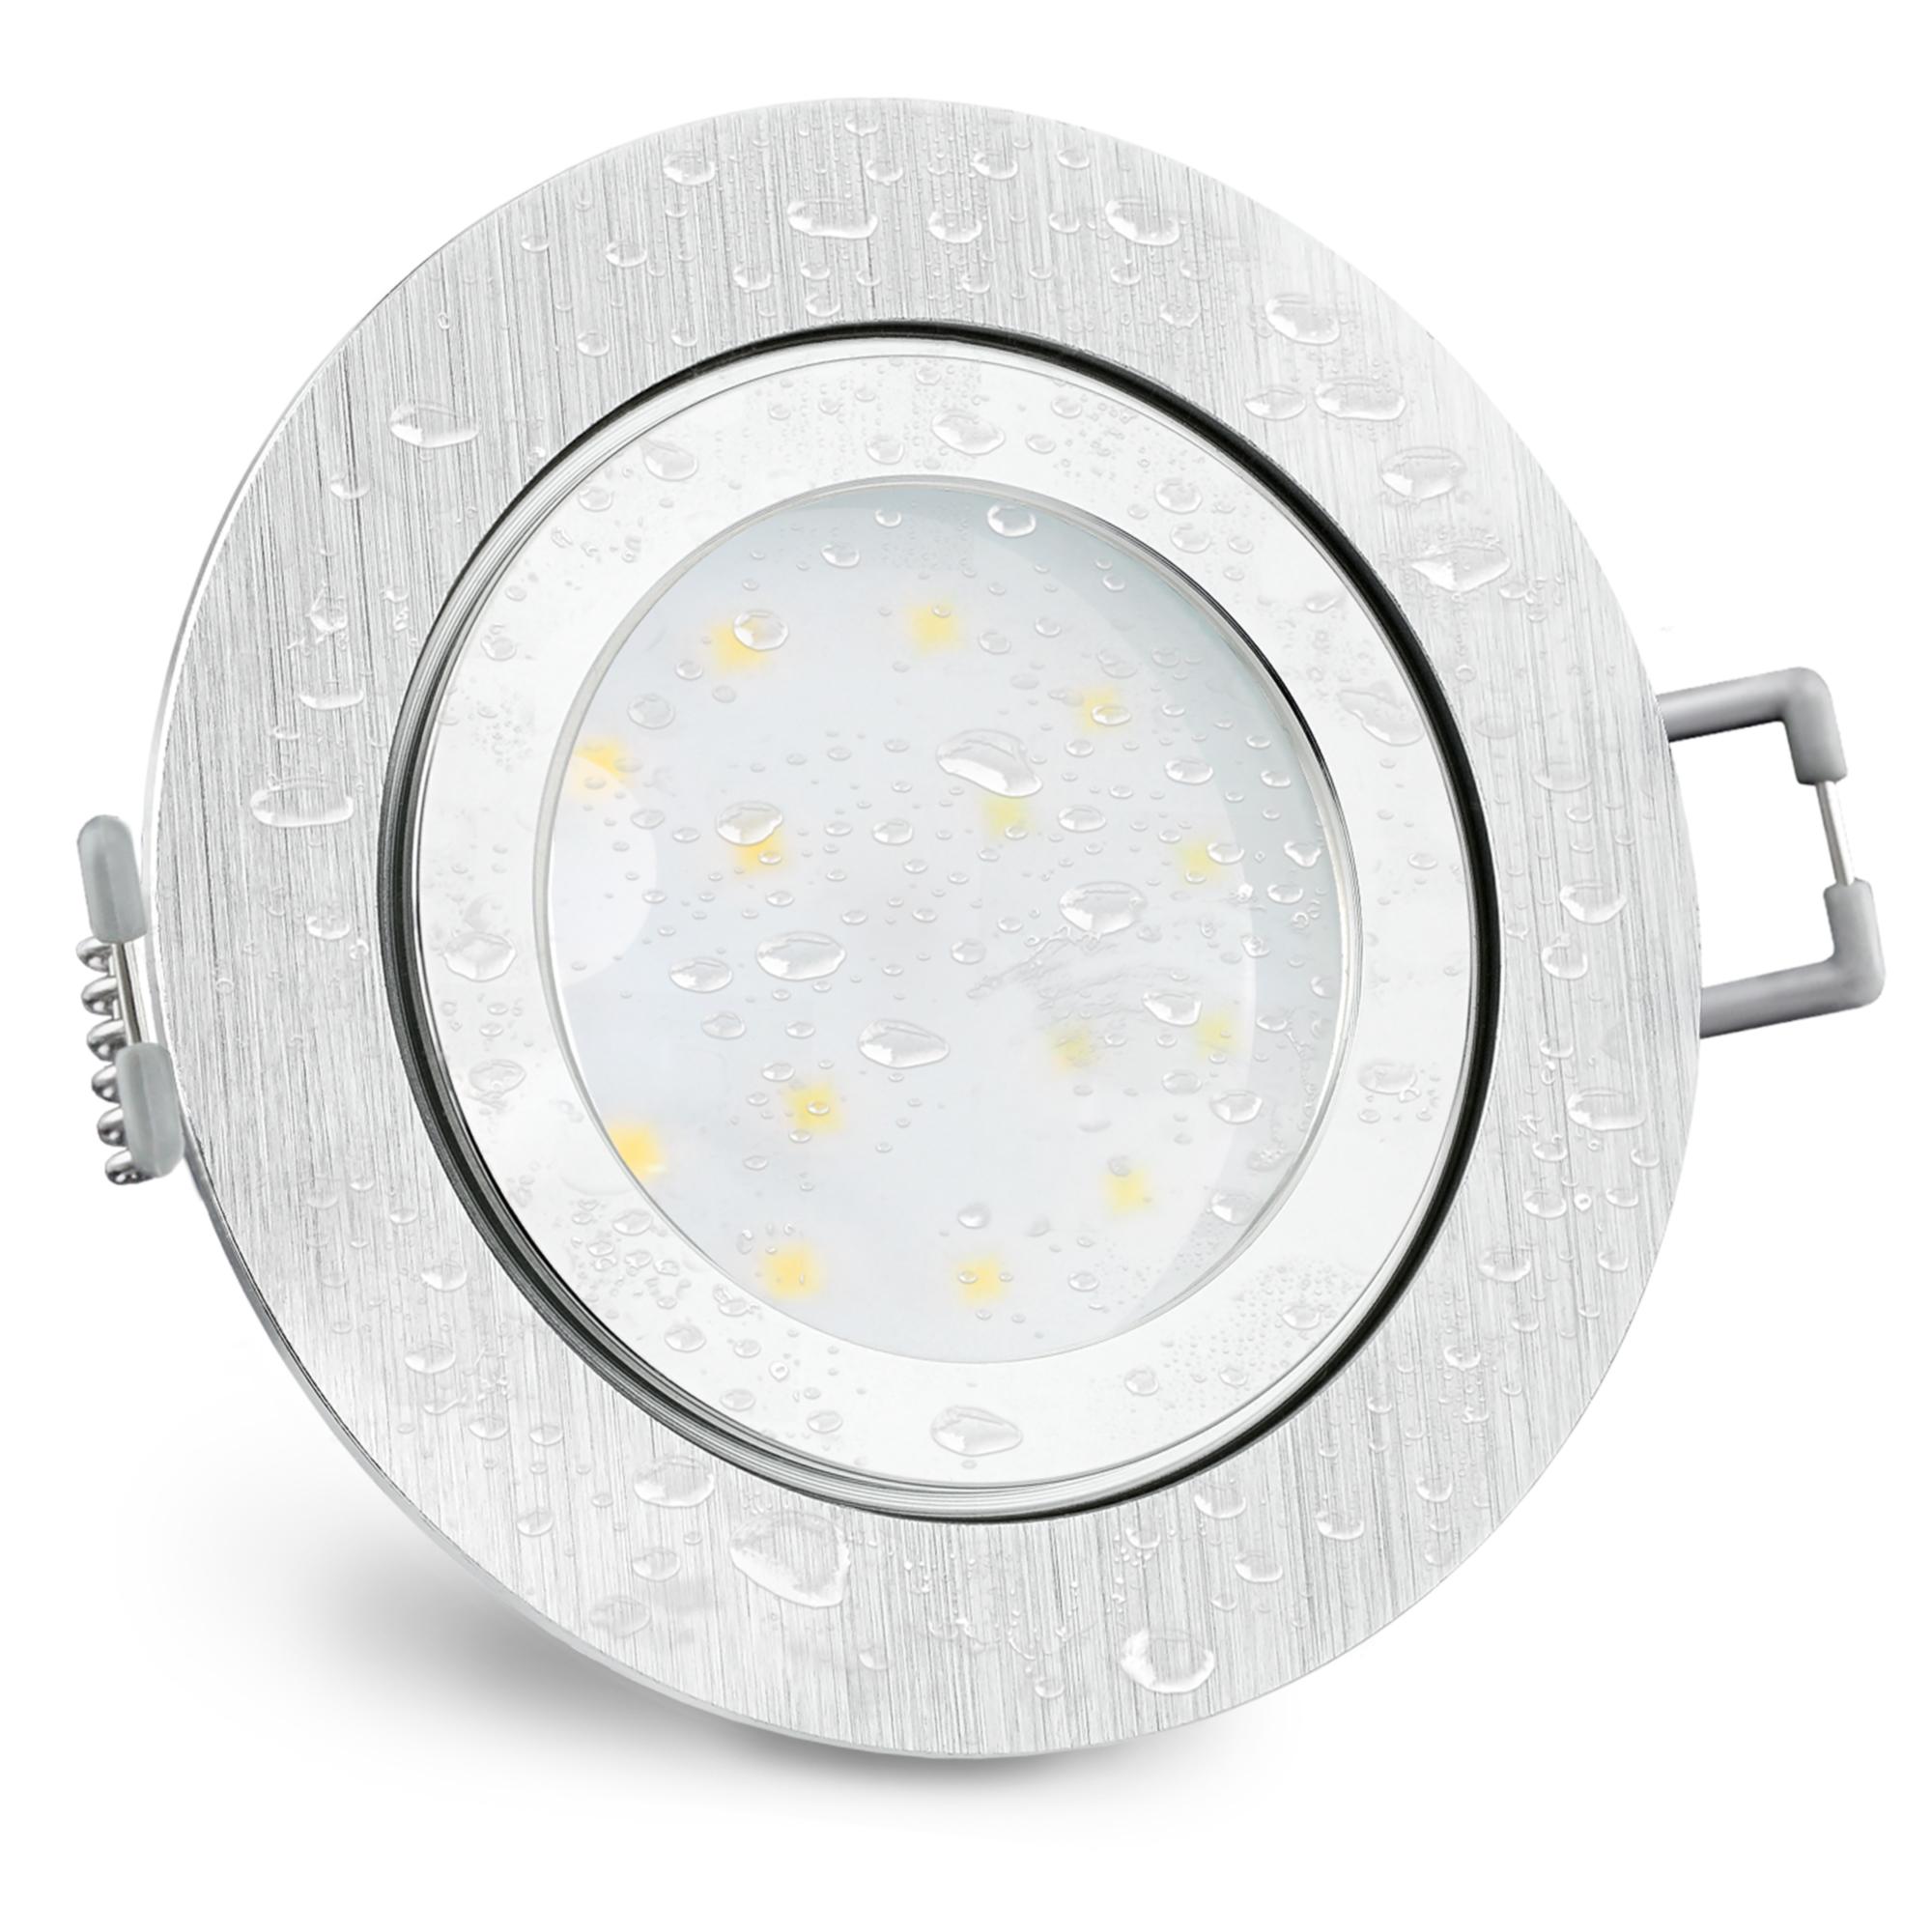 RW 20 flacher LED Einbauspot IP20 Alu gebürstet & rund inkl. dimmbarem LED  Modul 20W warmweiß 2030V